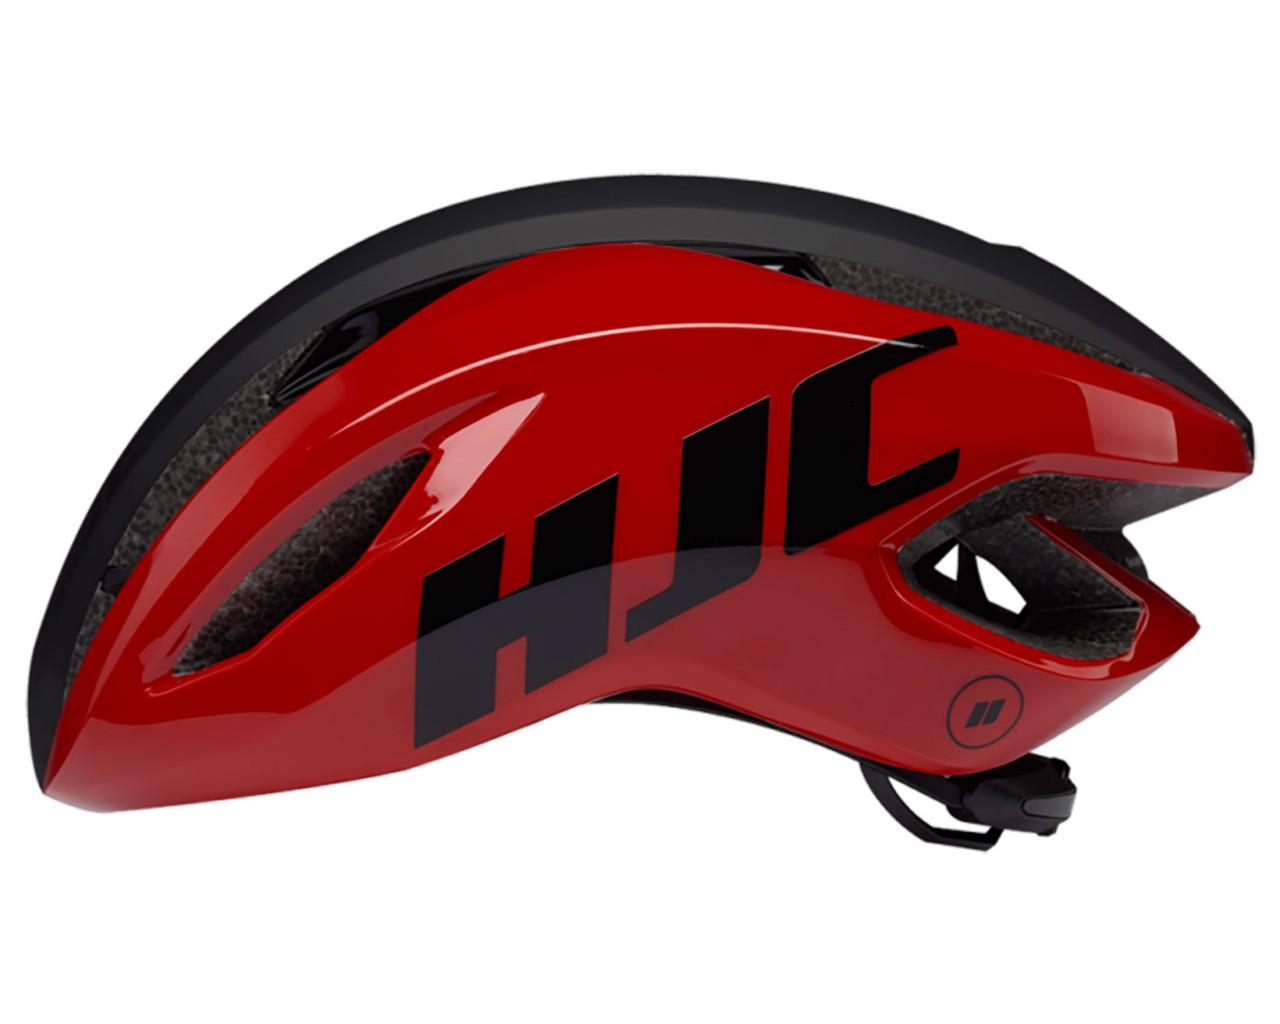 HJC Valeco Rennrad Helm | matt gloss red black